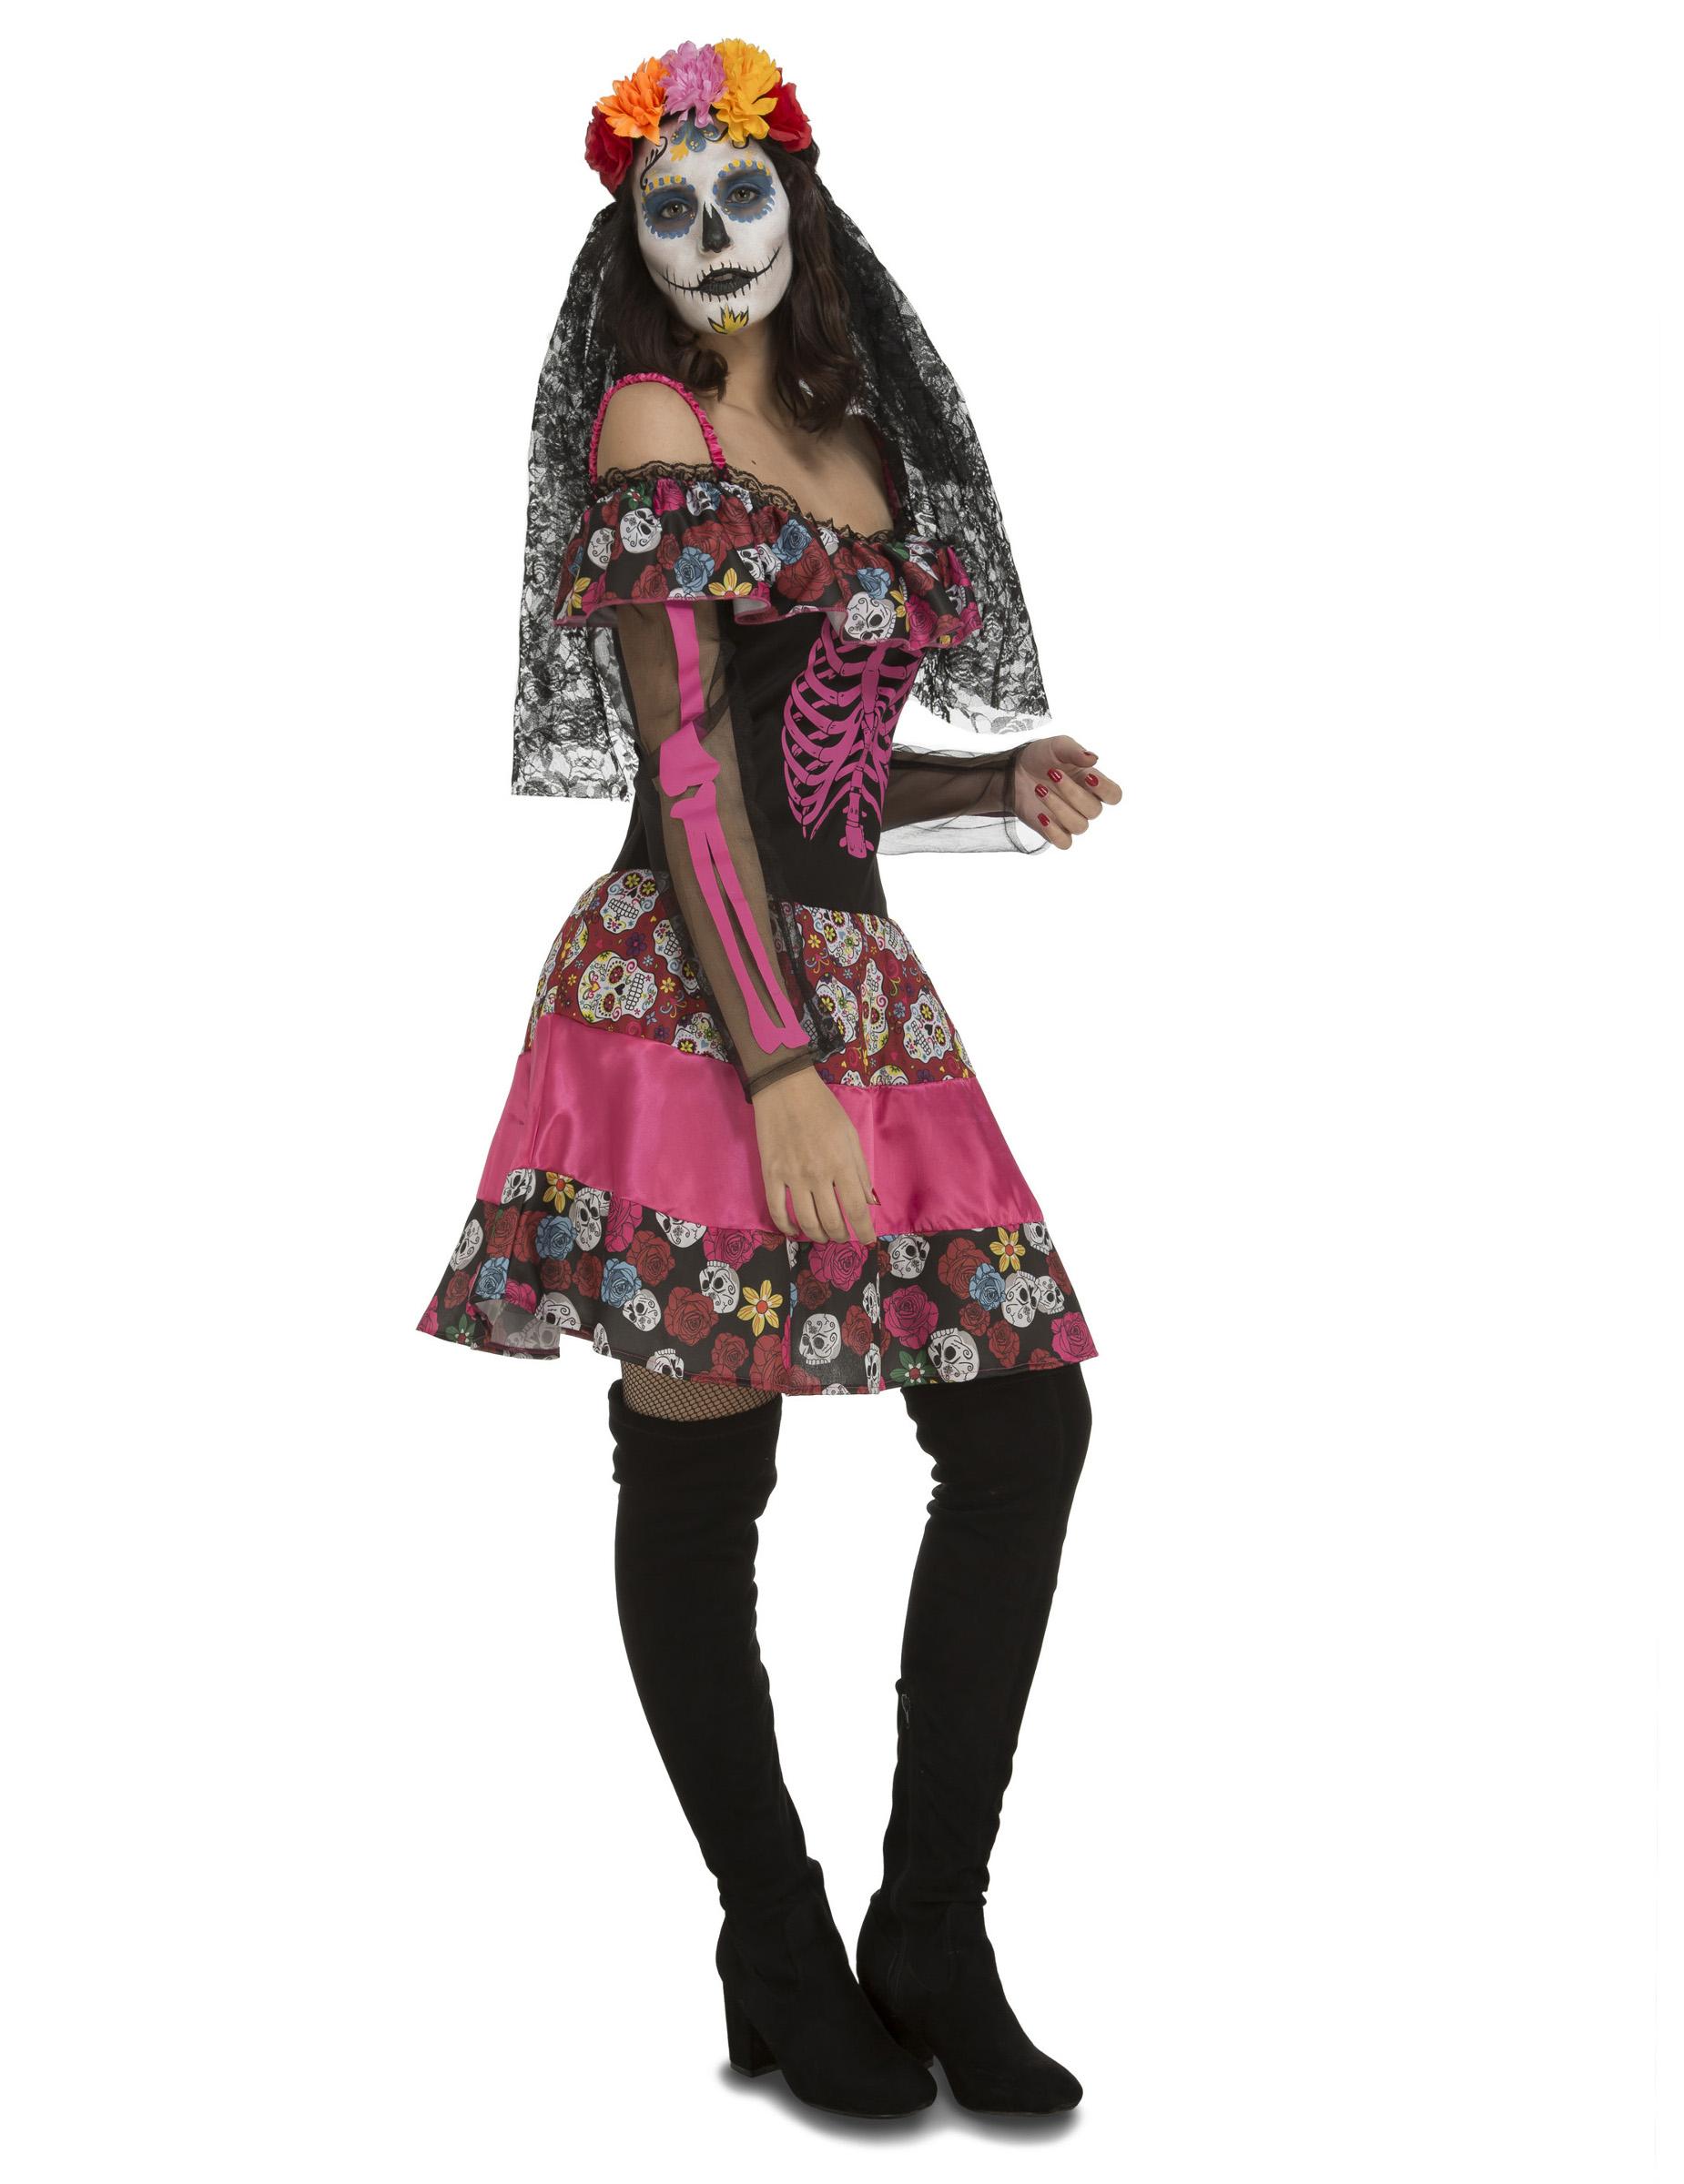 Wunderschönes Tag der Toten Kleid für Damen Dia de los Muertos Kostüm pink bunt